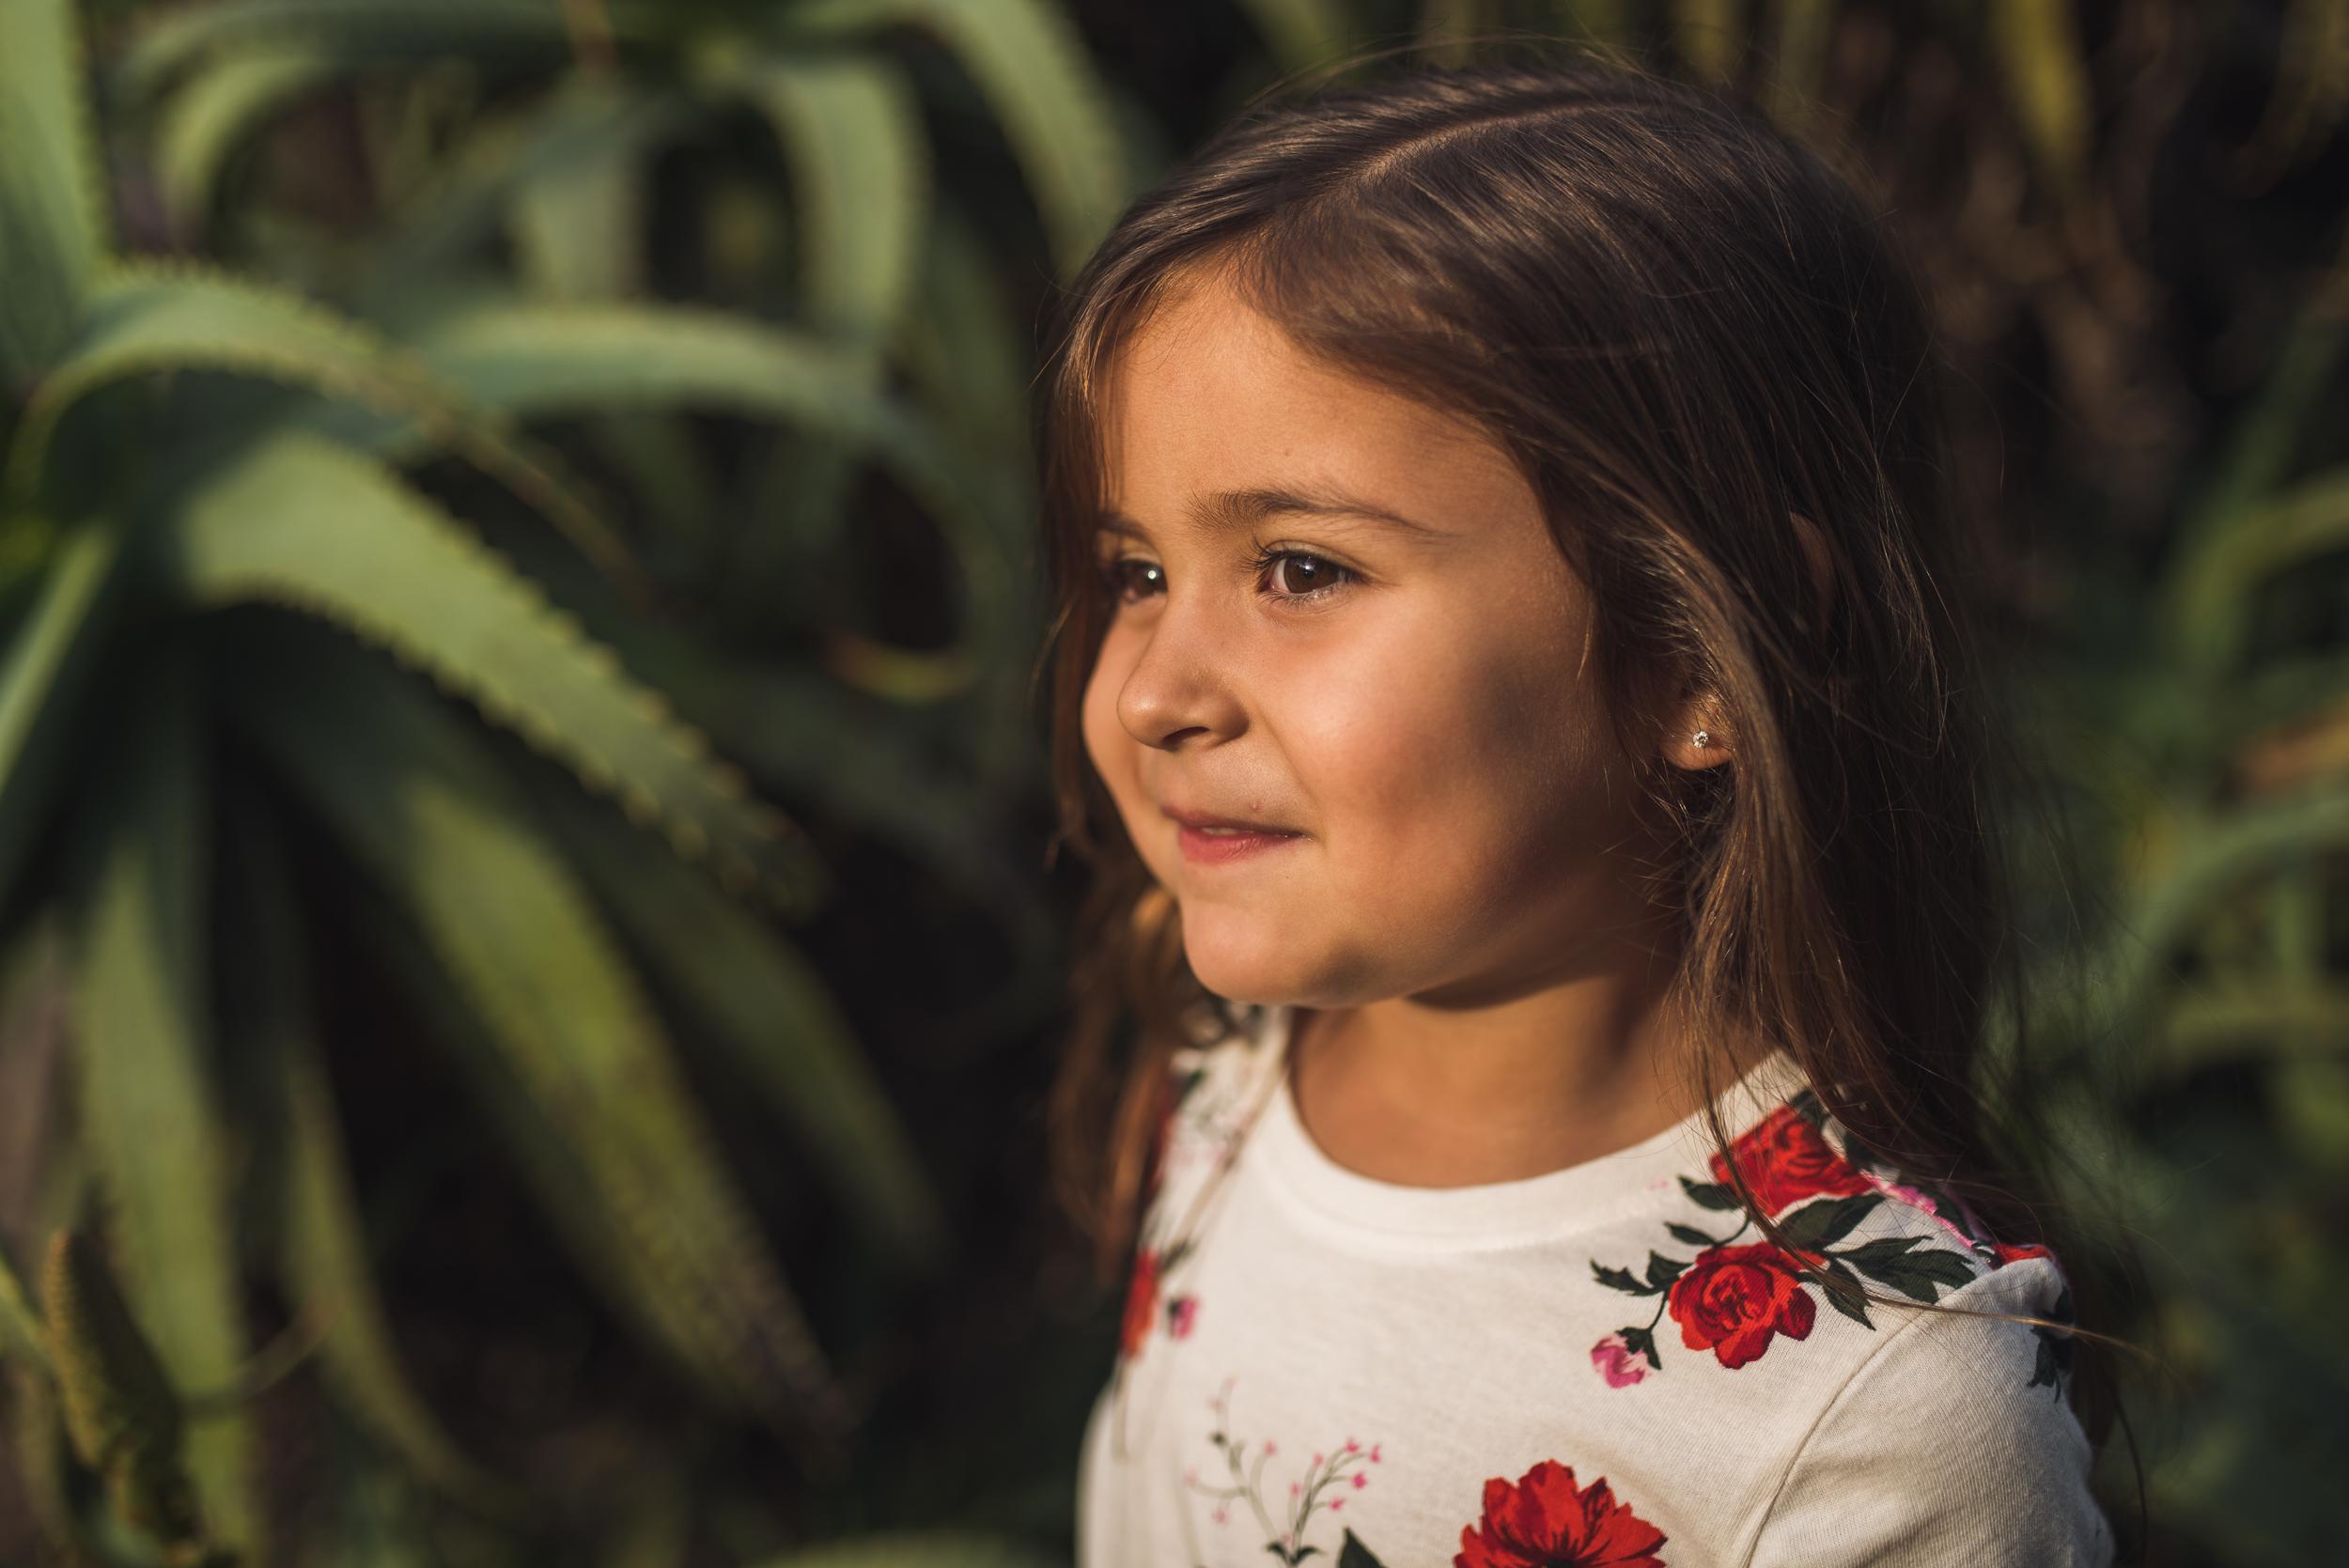 2018-San-Diego-Family-Lifestyle-Newborn-Travel-Vacation-Photographer-Kelsey-Smith-Photography-Coronado-La-Jolla-Encinitas-Solana-Beach-Del-Mar-99.jpg